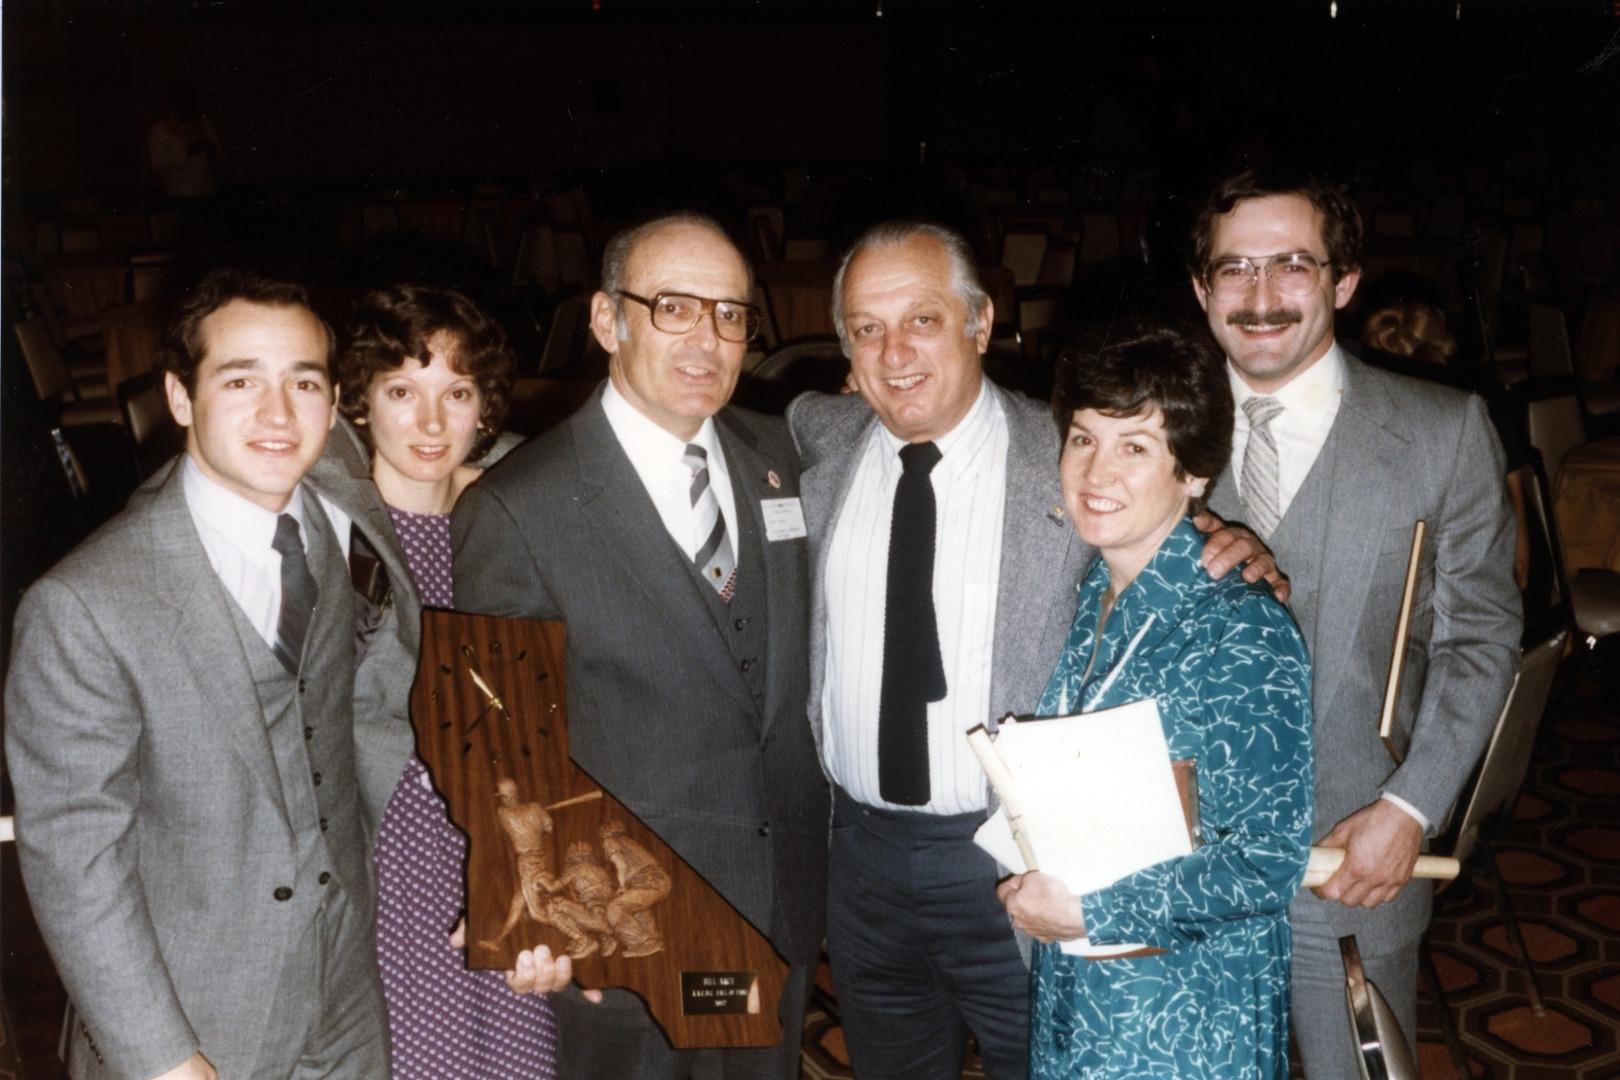 Bill Arce and Tommy Lasorda